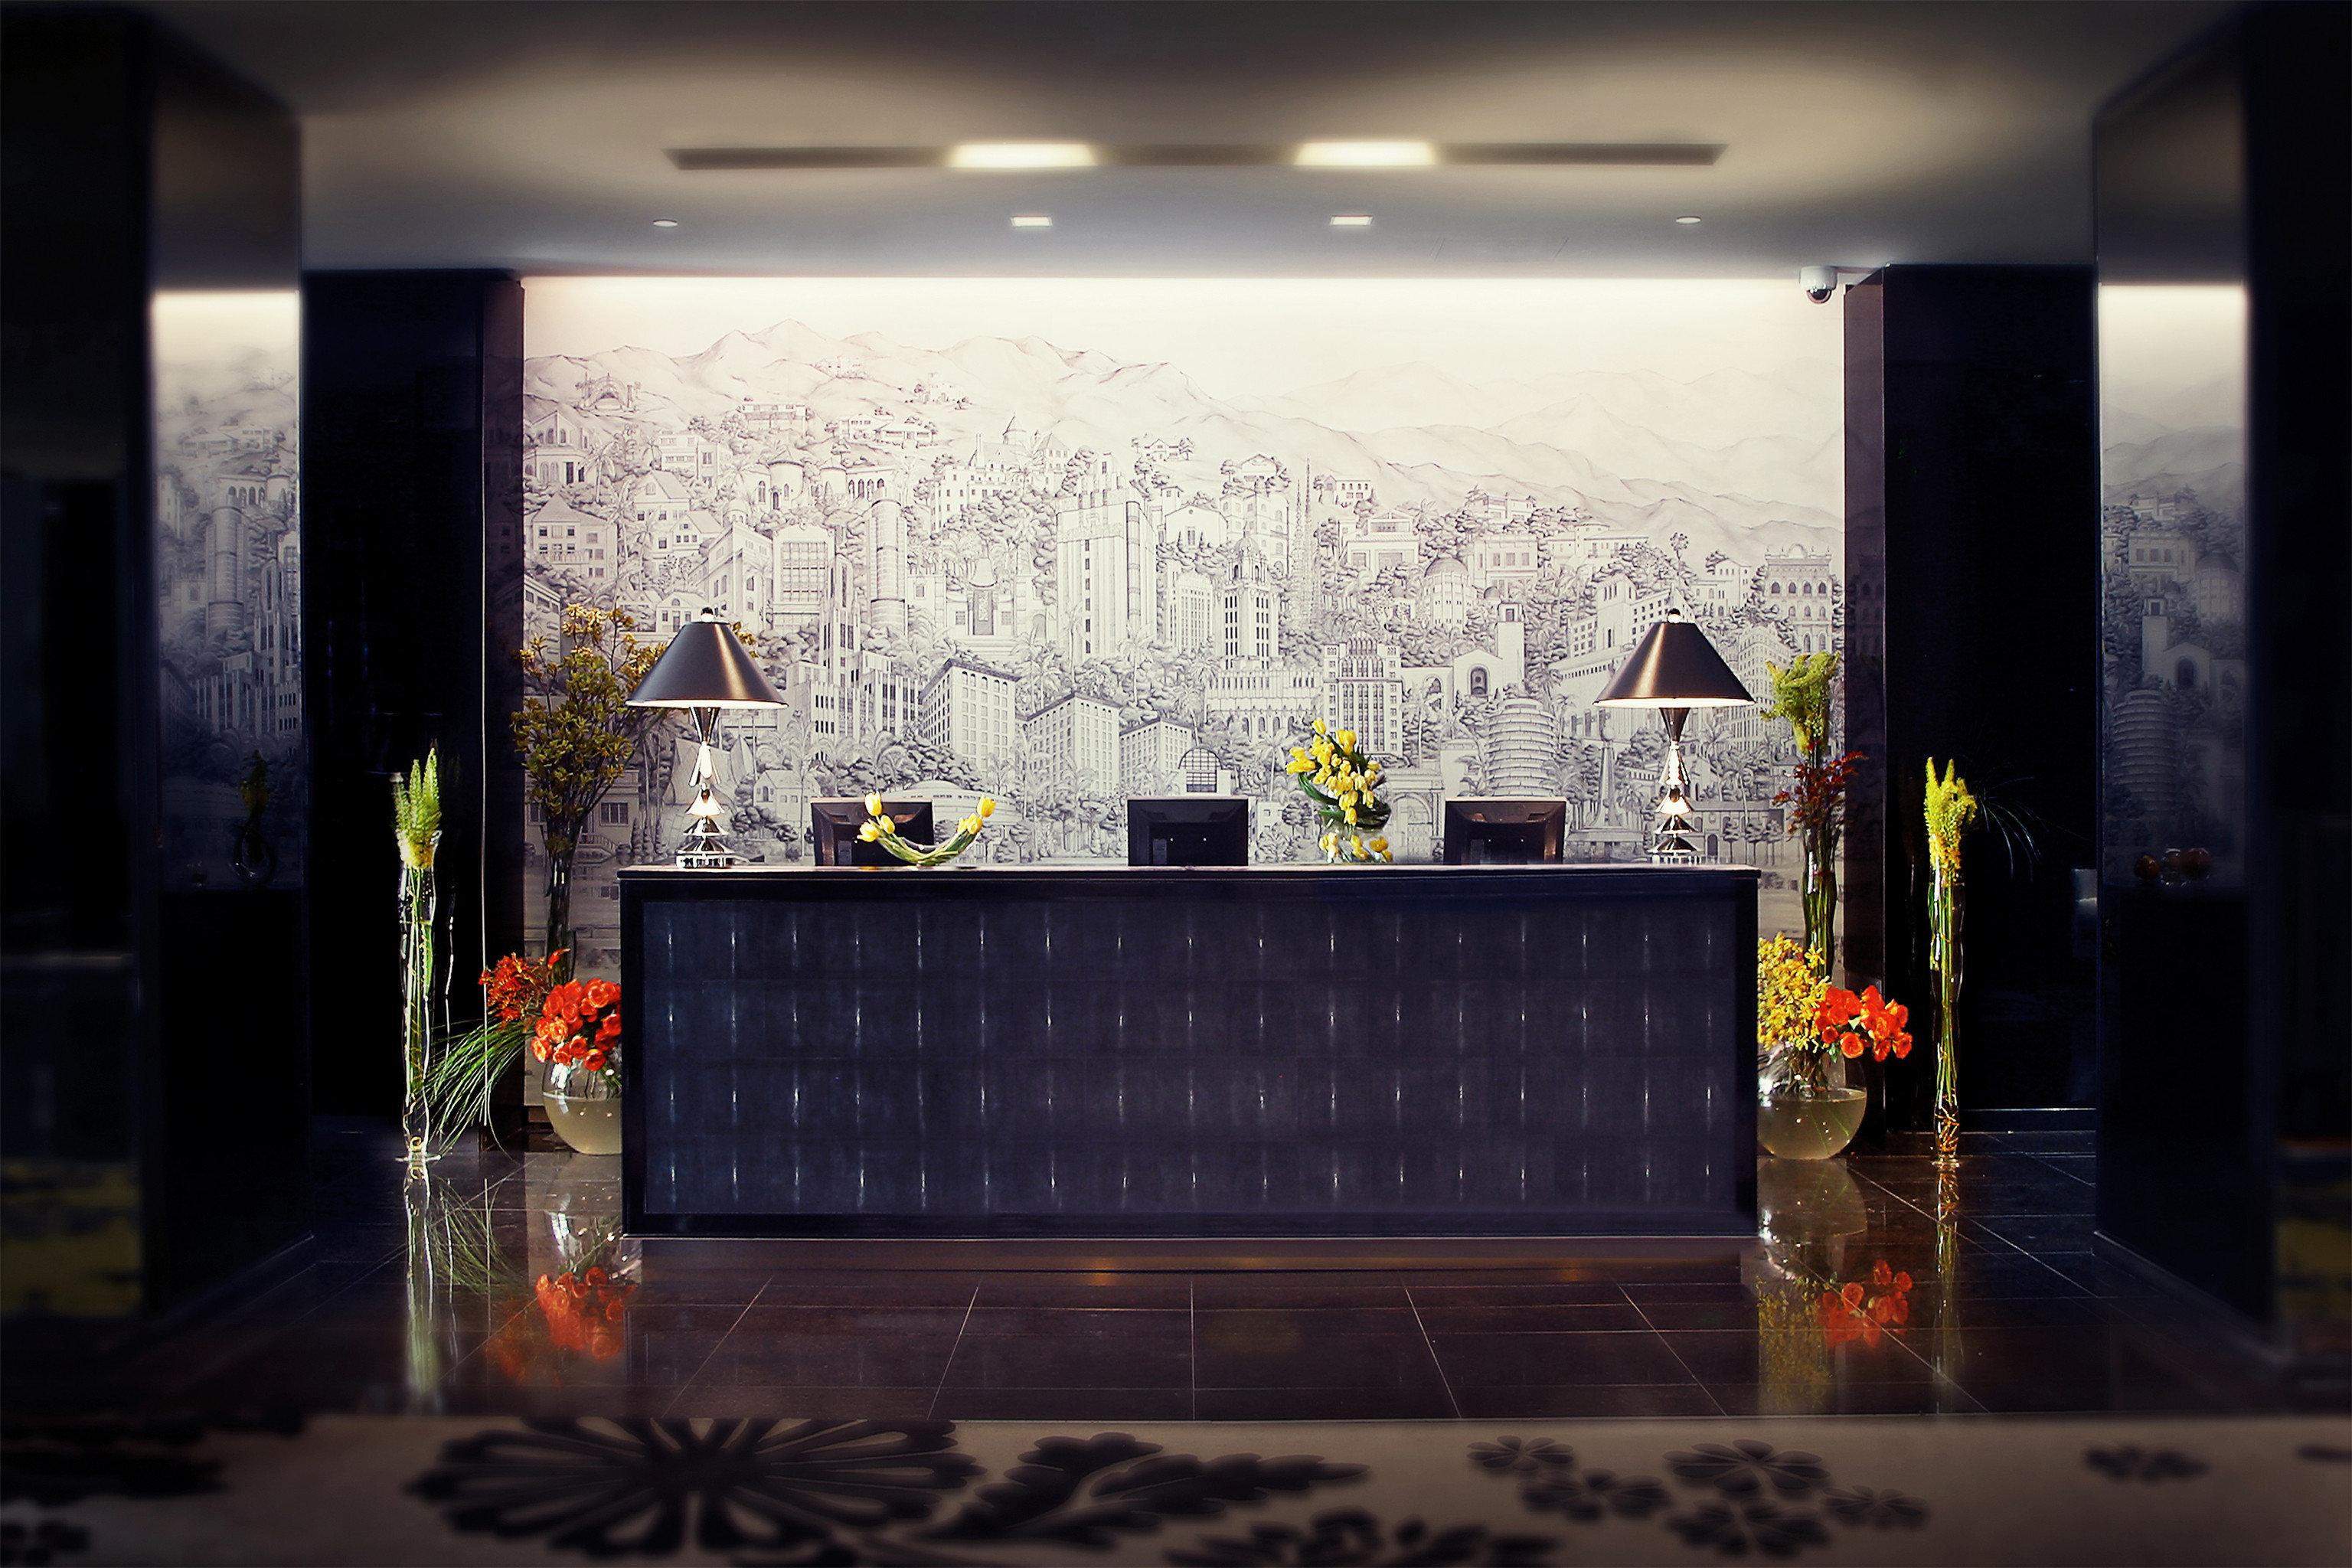 City Classic Lobby Resort light art